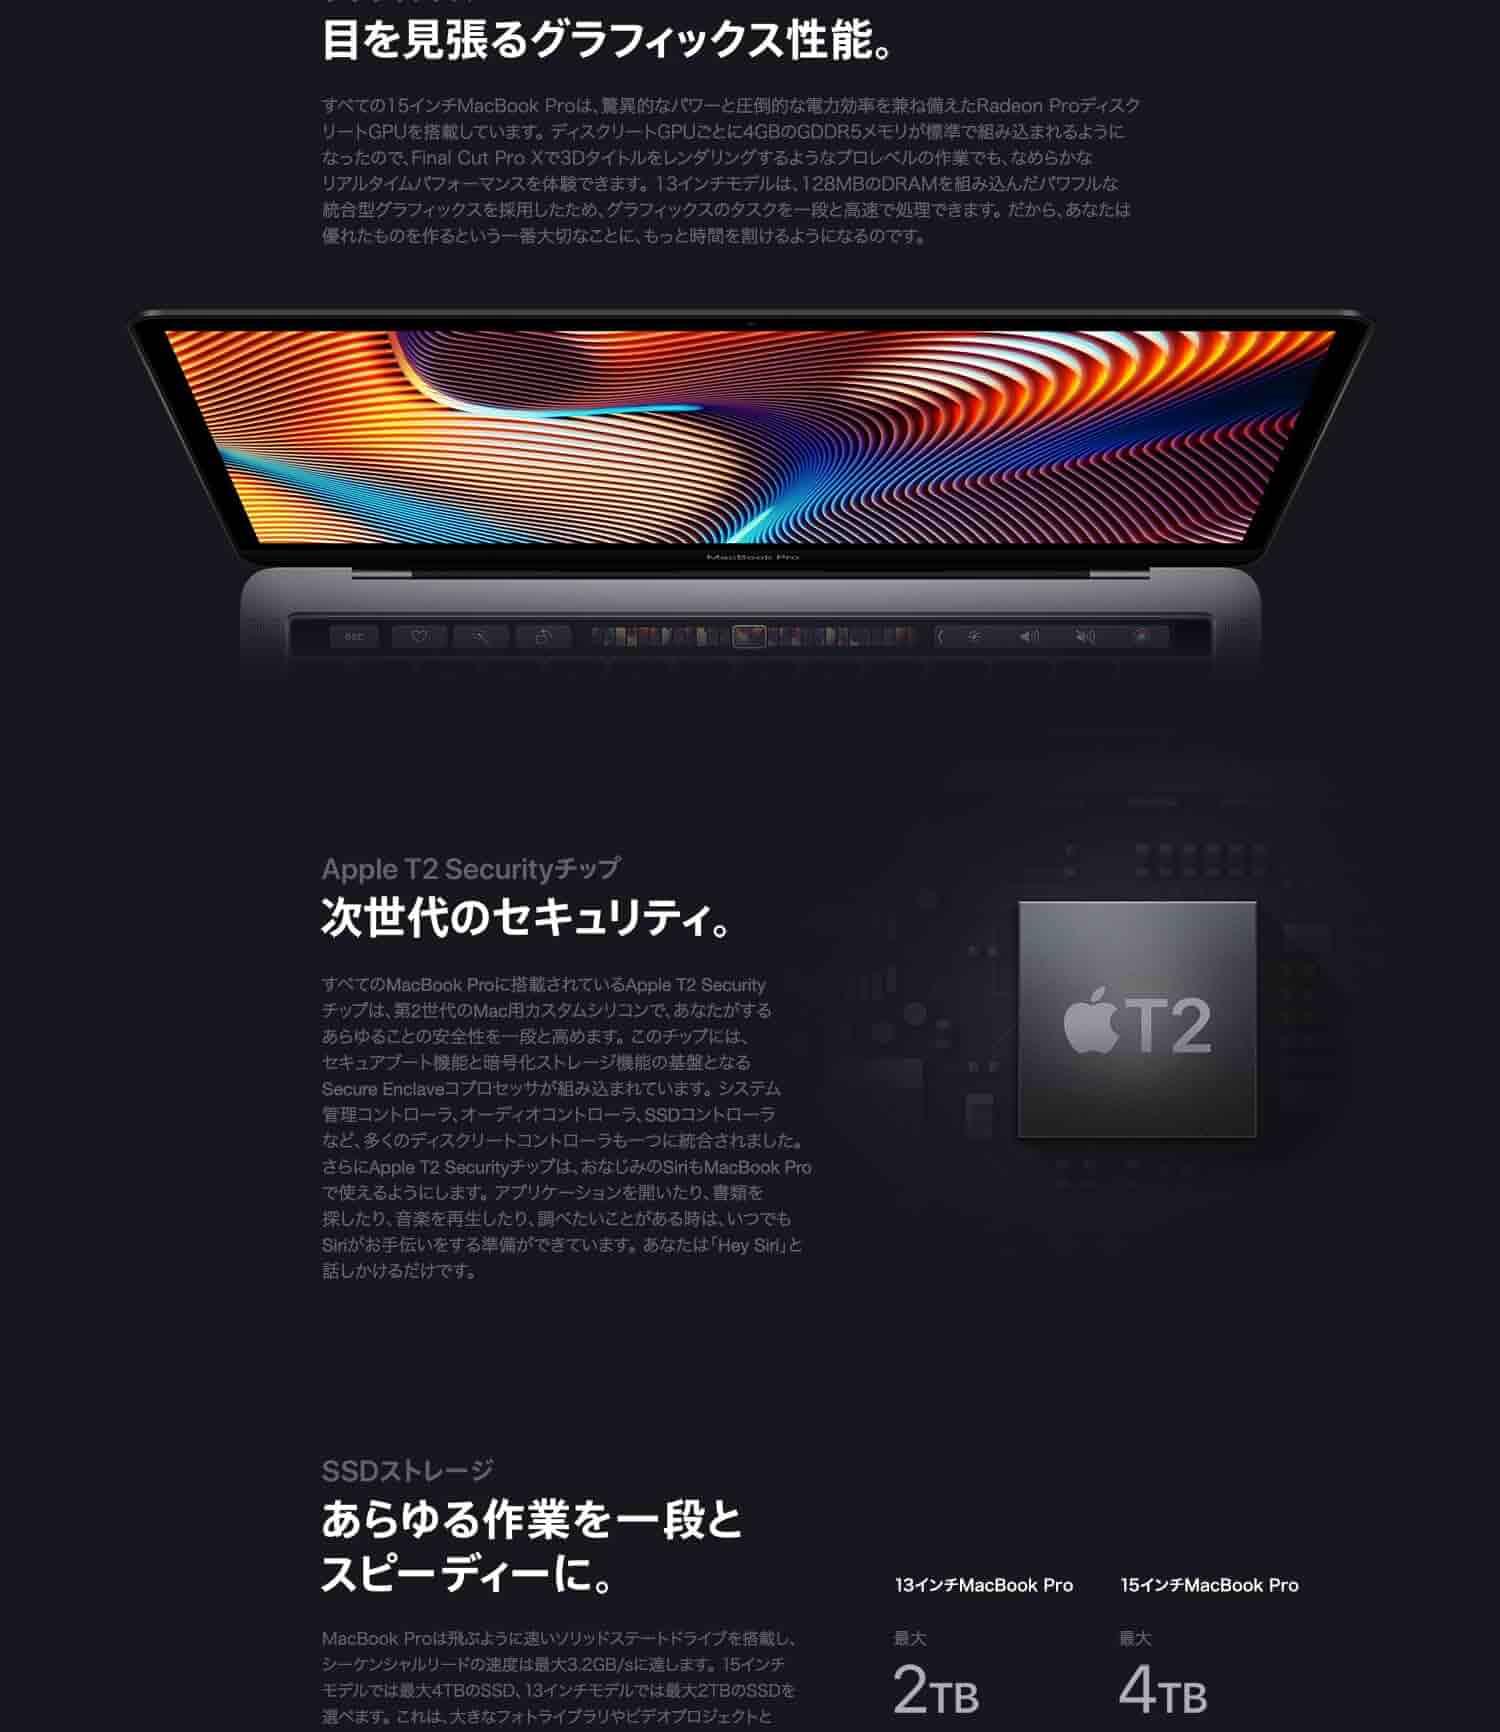 Macbook Pro (Latest model)